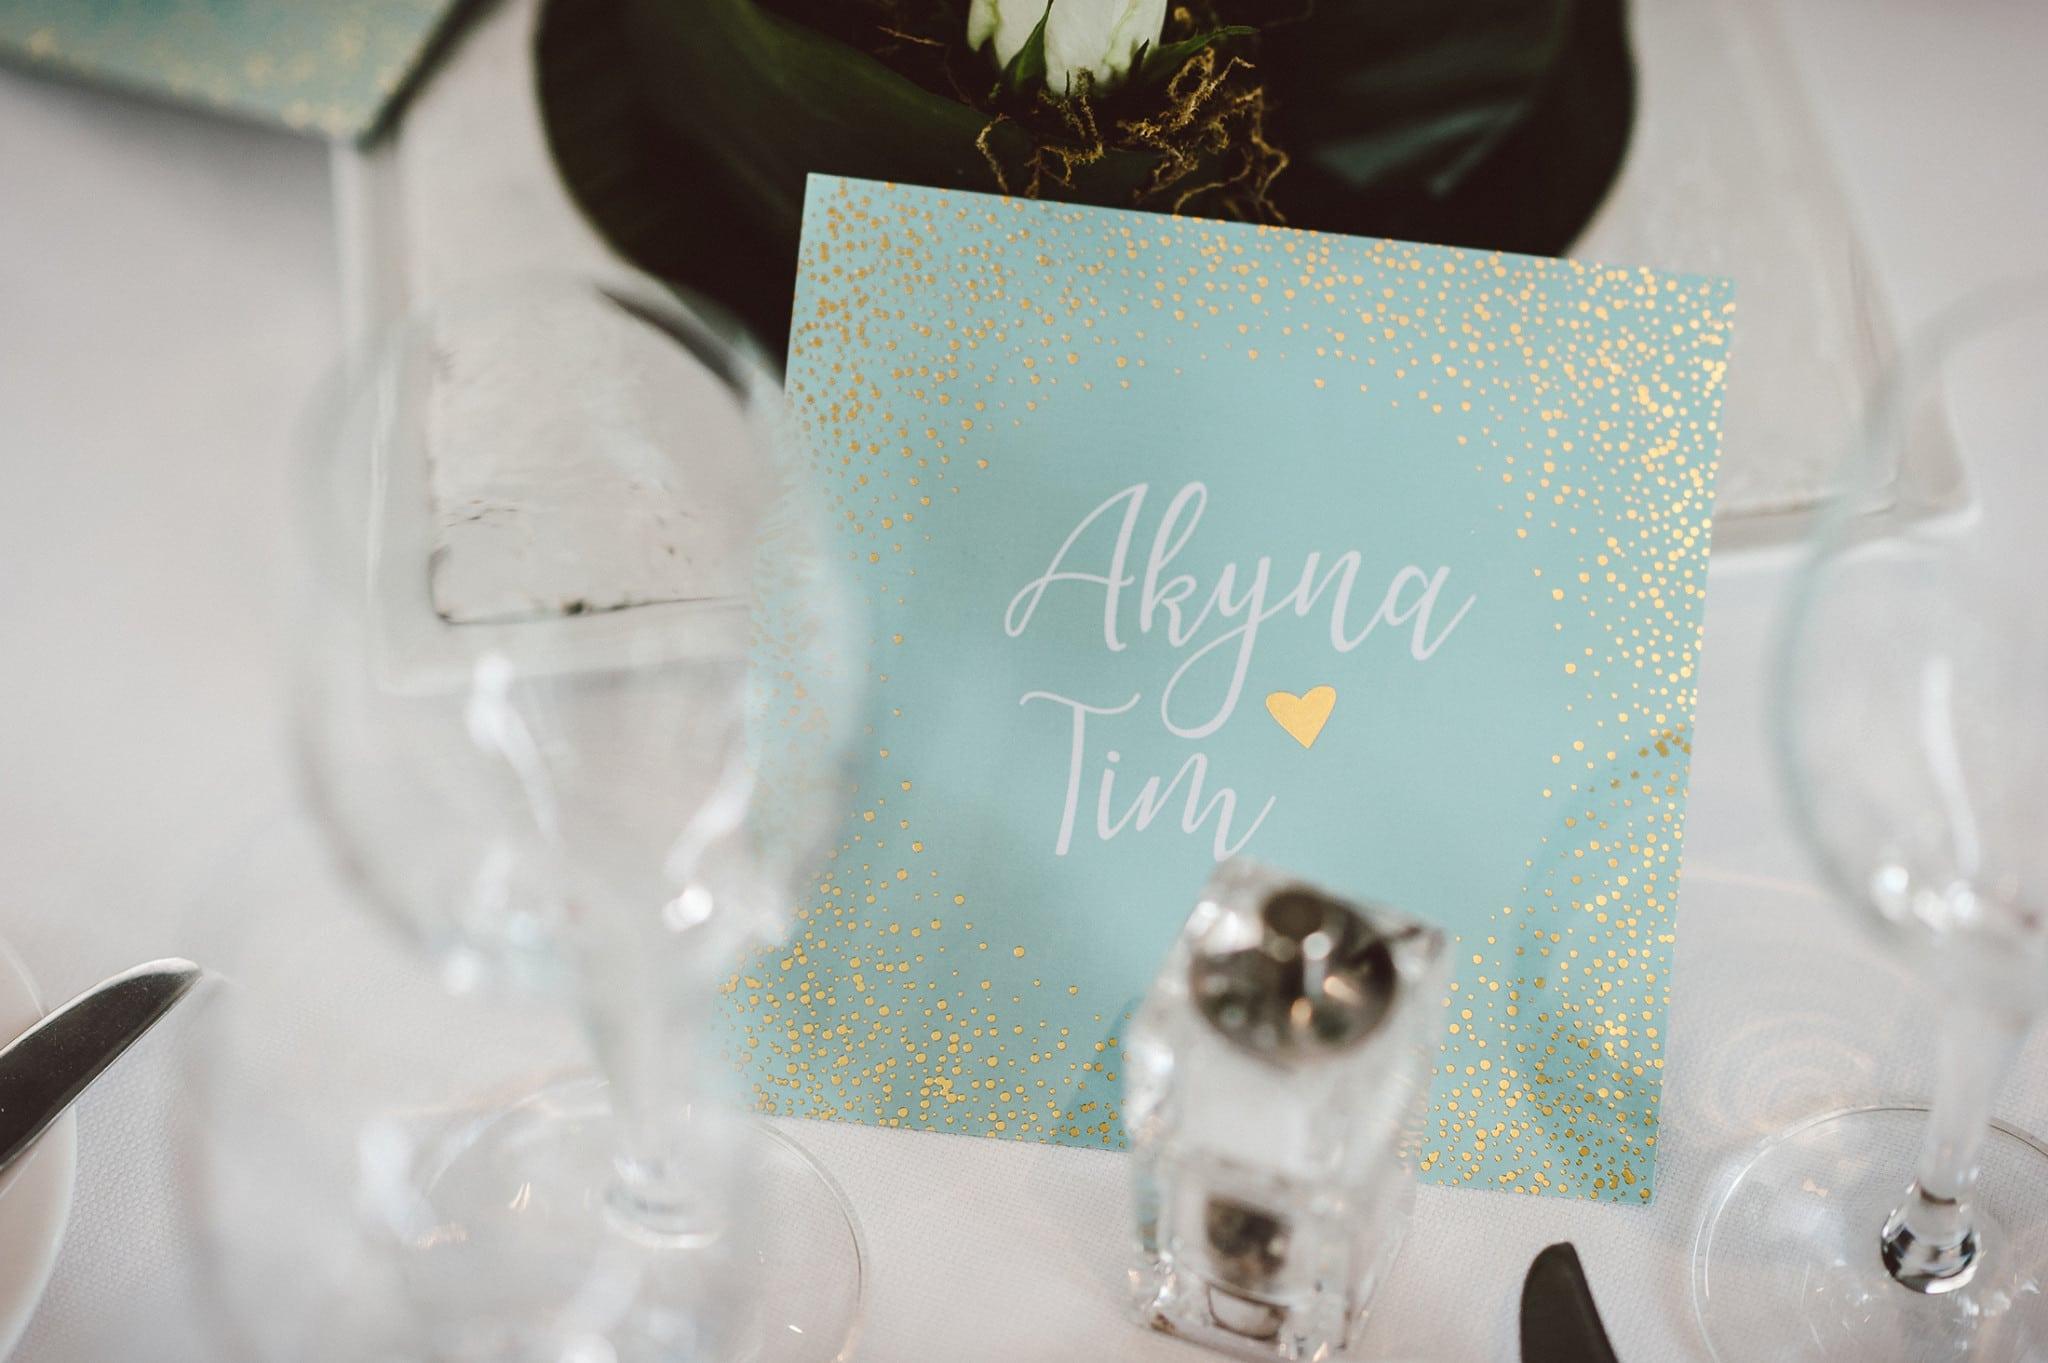 Menukaart huwelijk Akyna & Tim